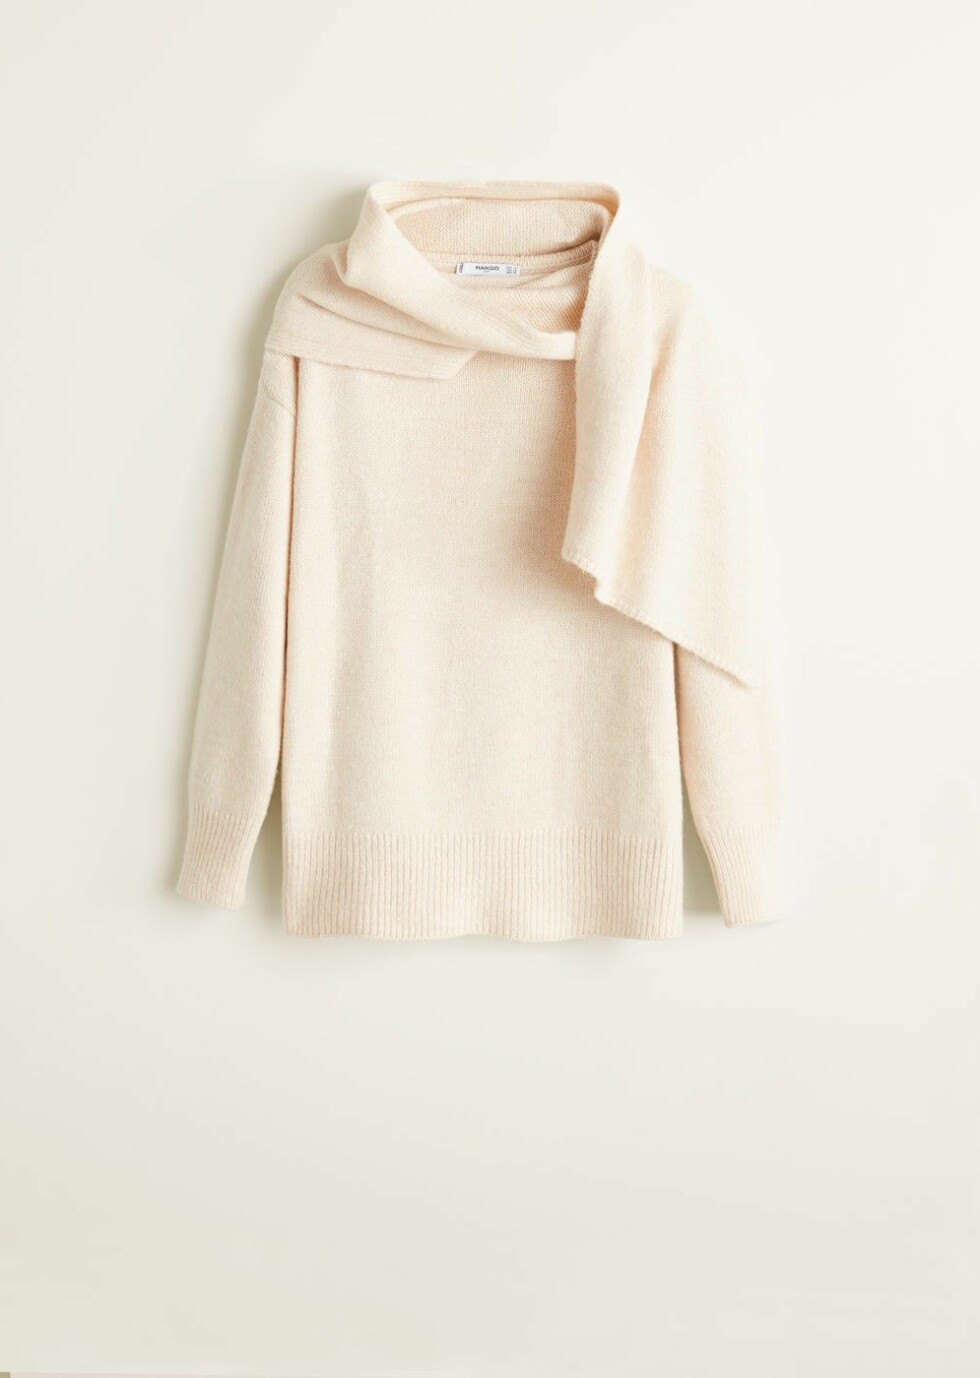 Genser fra Mango |450,-| https://shop.mango.com/gb/women/cardigans-and-sweaters-sweaters/scarf-neck-sweater_33087020.html?c=05&n=1&s=prendas_she.familia%3B55%2C355%2C610%2C810&utm_medium=affiliate&utm_source=2P555SNI1Kc&utm_campaign=Linkshare_UK&ranMID=36057&ranEAID=2P555SNI1Kc&ranSiteID=2P555SNI1Kc-_dheSz9dht.J3SbkZy4Ijg